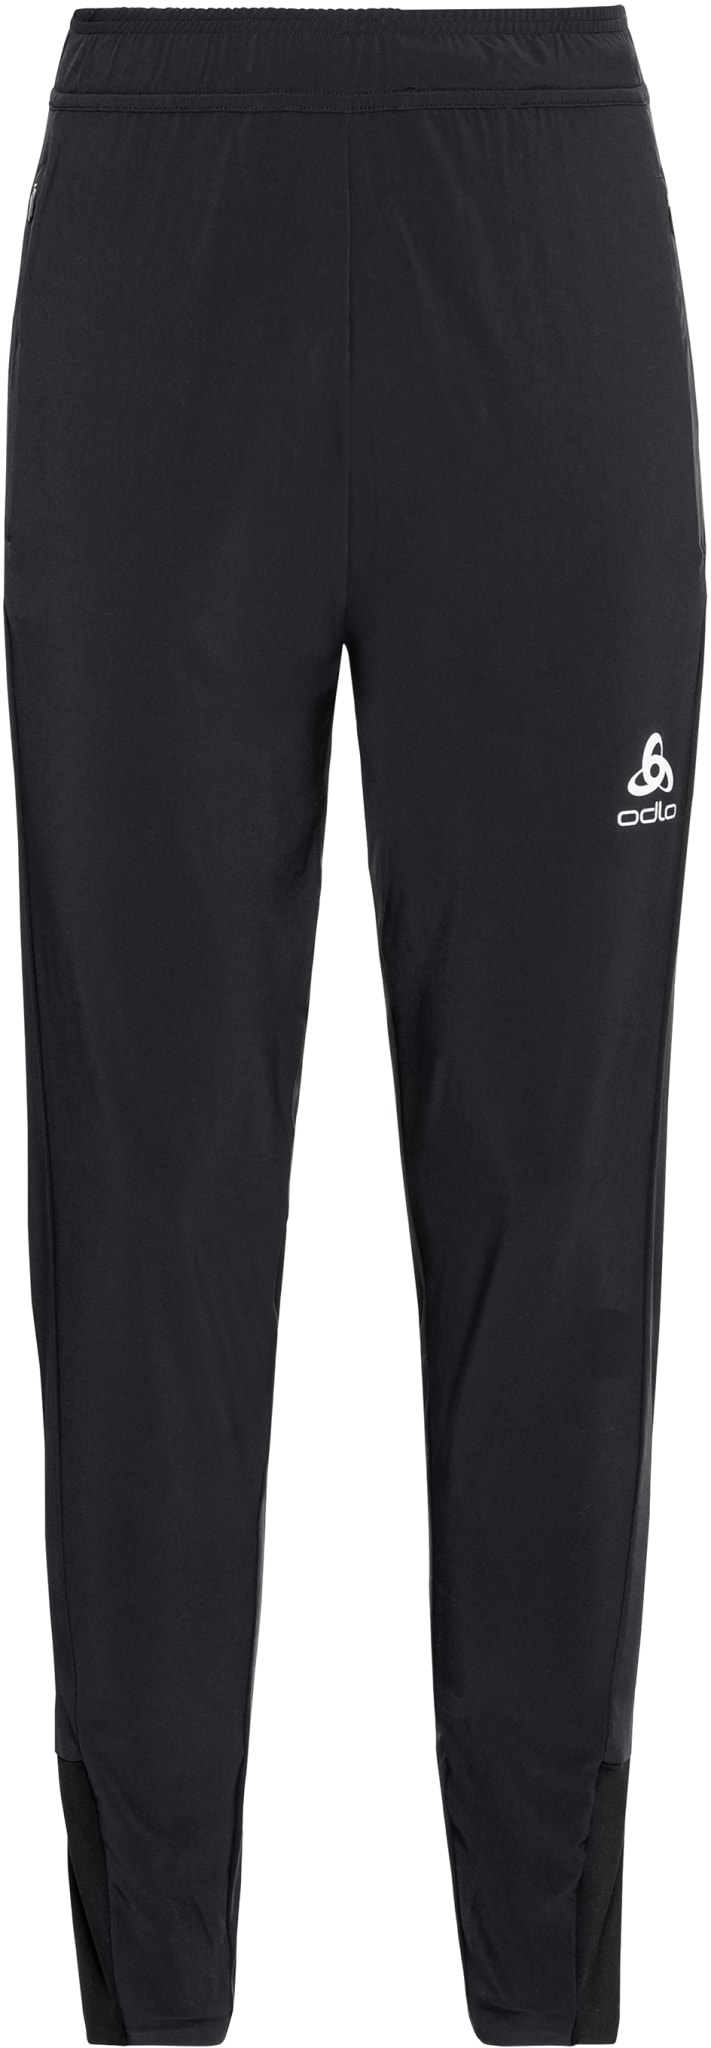 Zeroweight Pants M